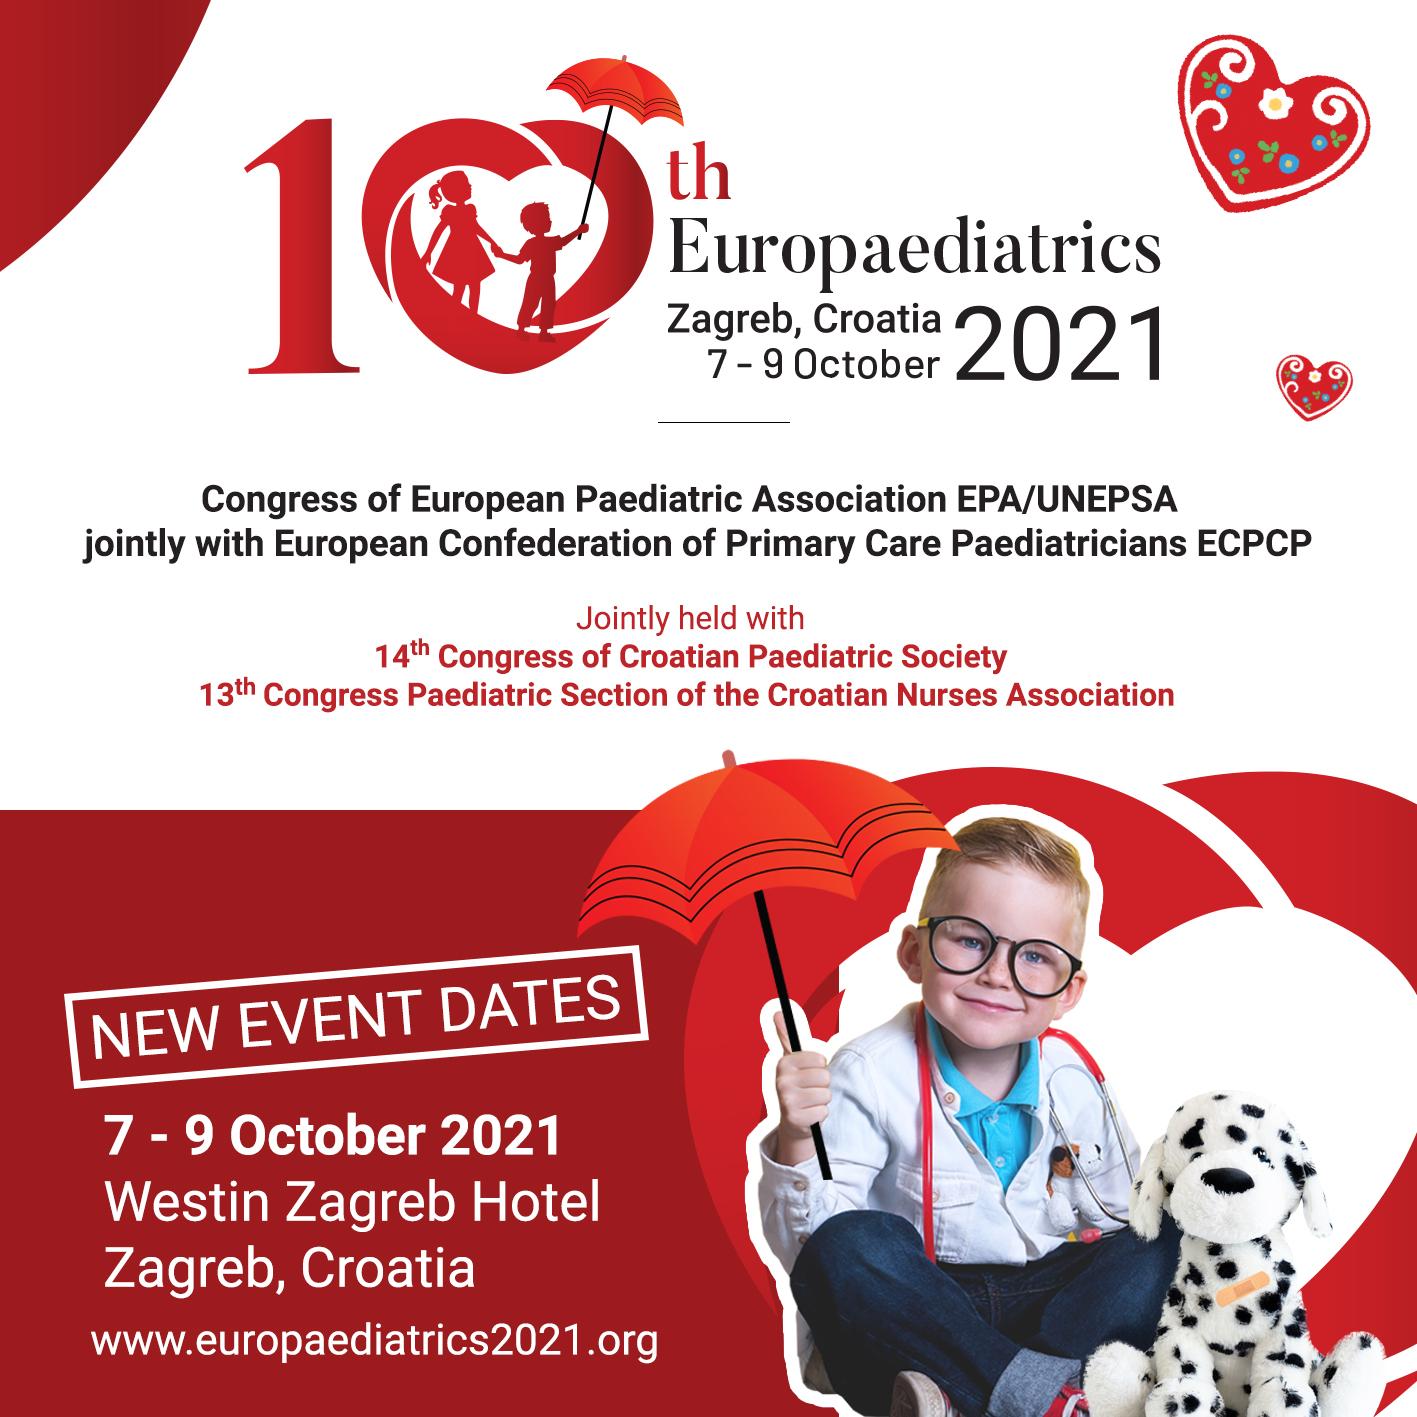 10th Europaediatrics | 7-9 October 2021| Zagreb, Croatia